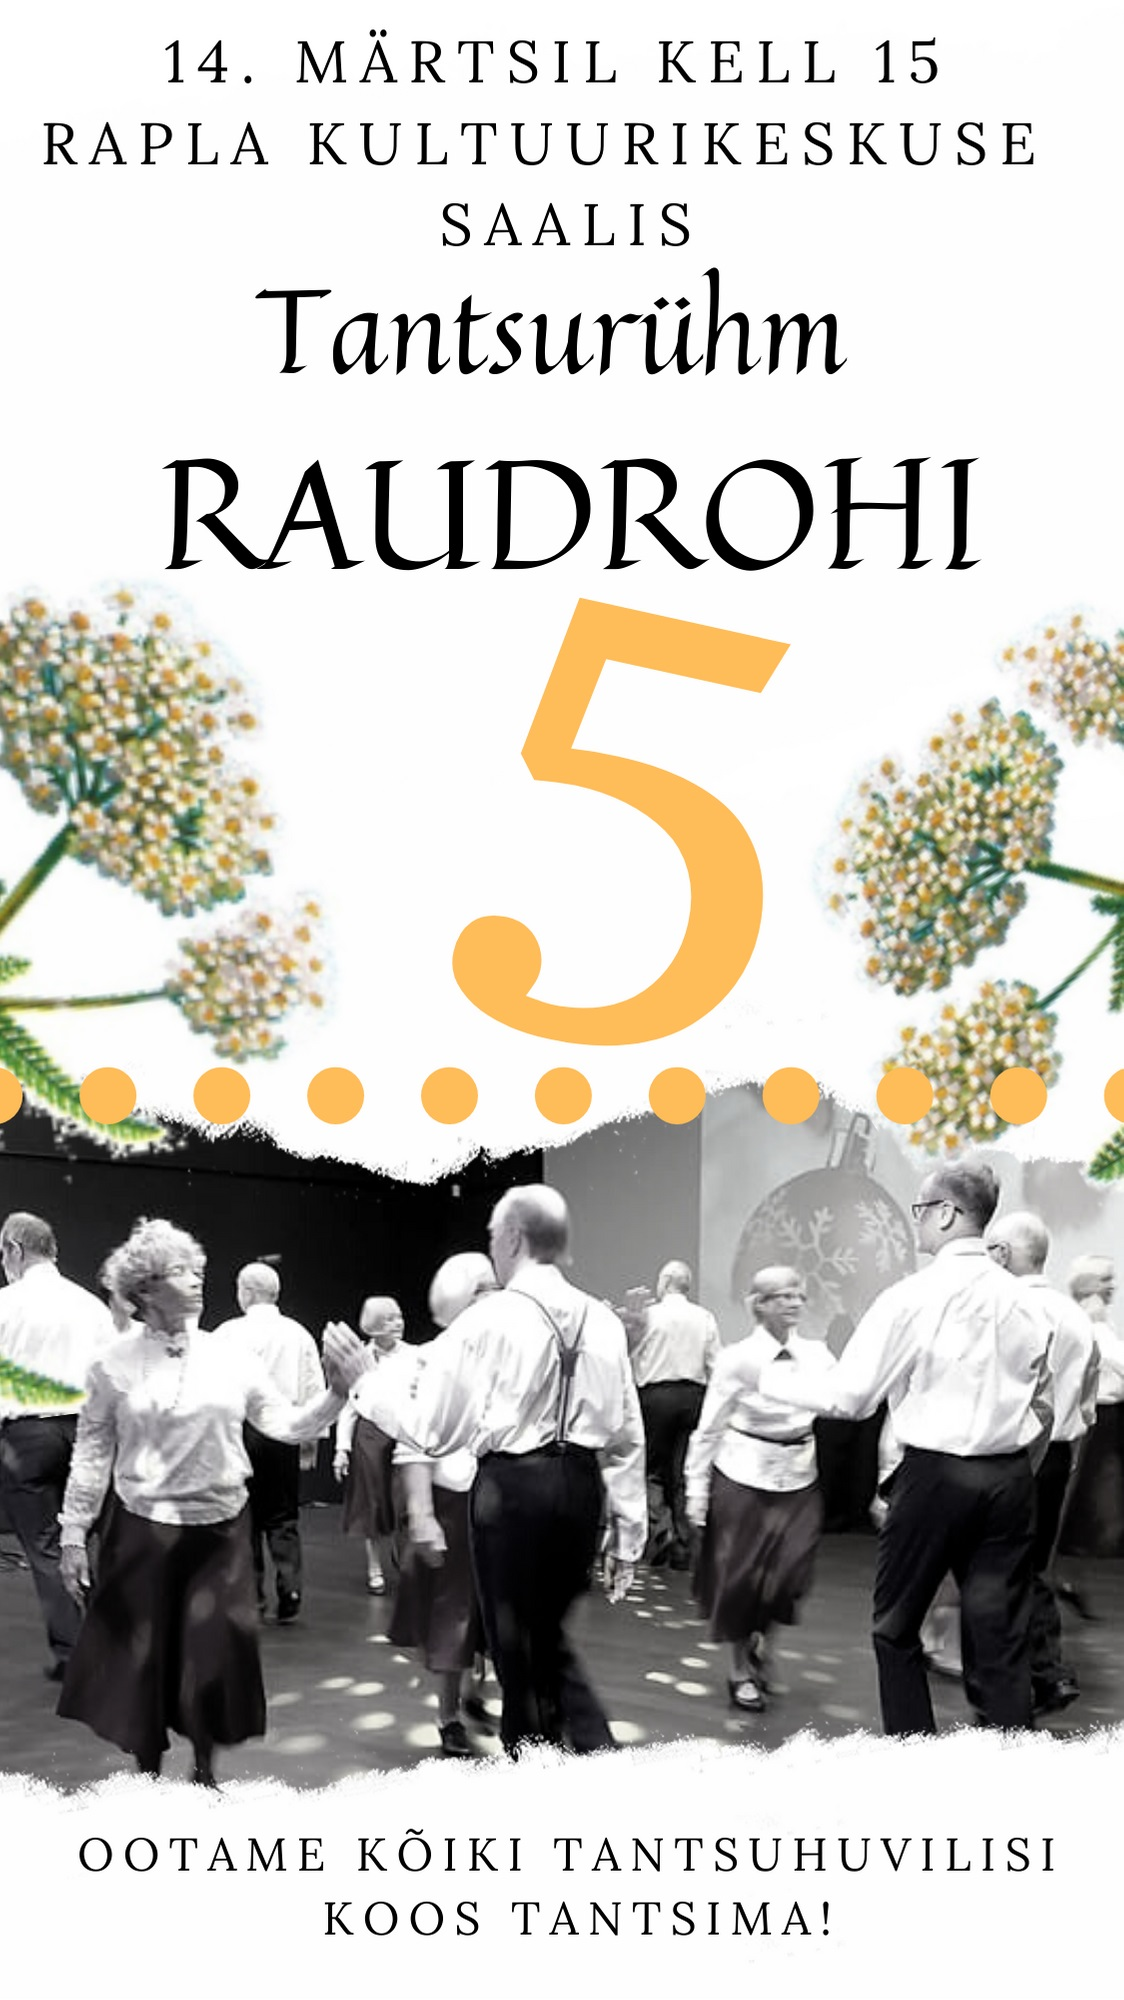 Raudrohi 5